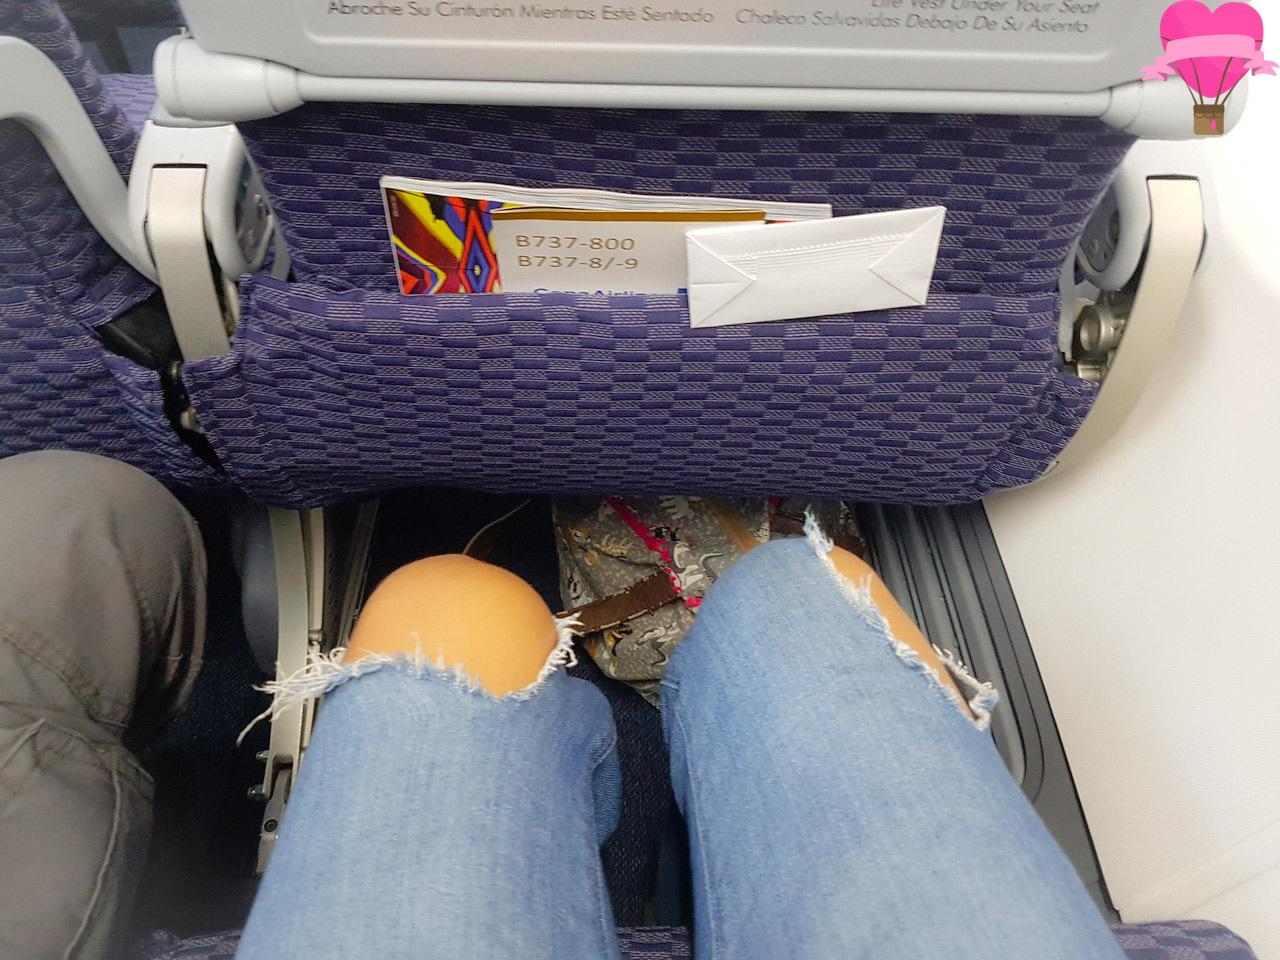 copaairlines-companhia-aerea-cancun